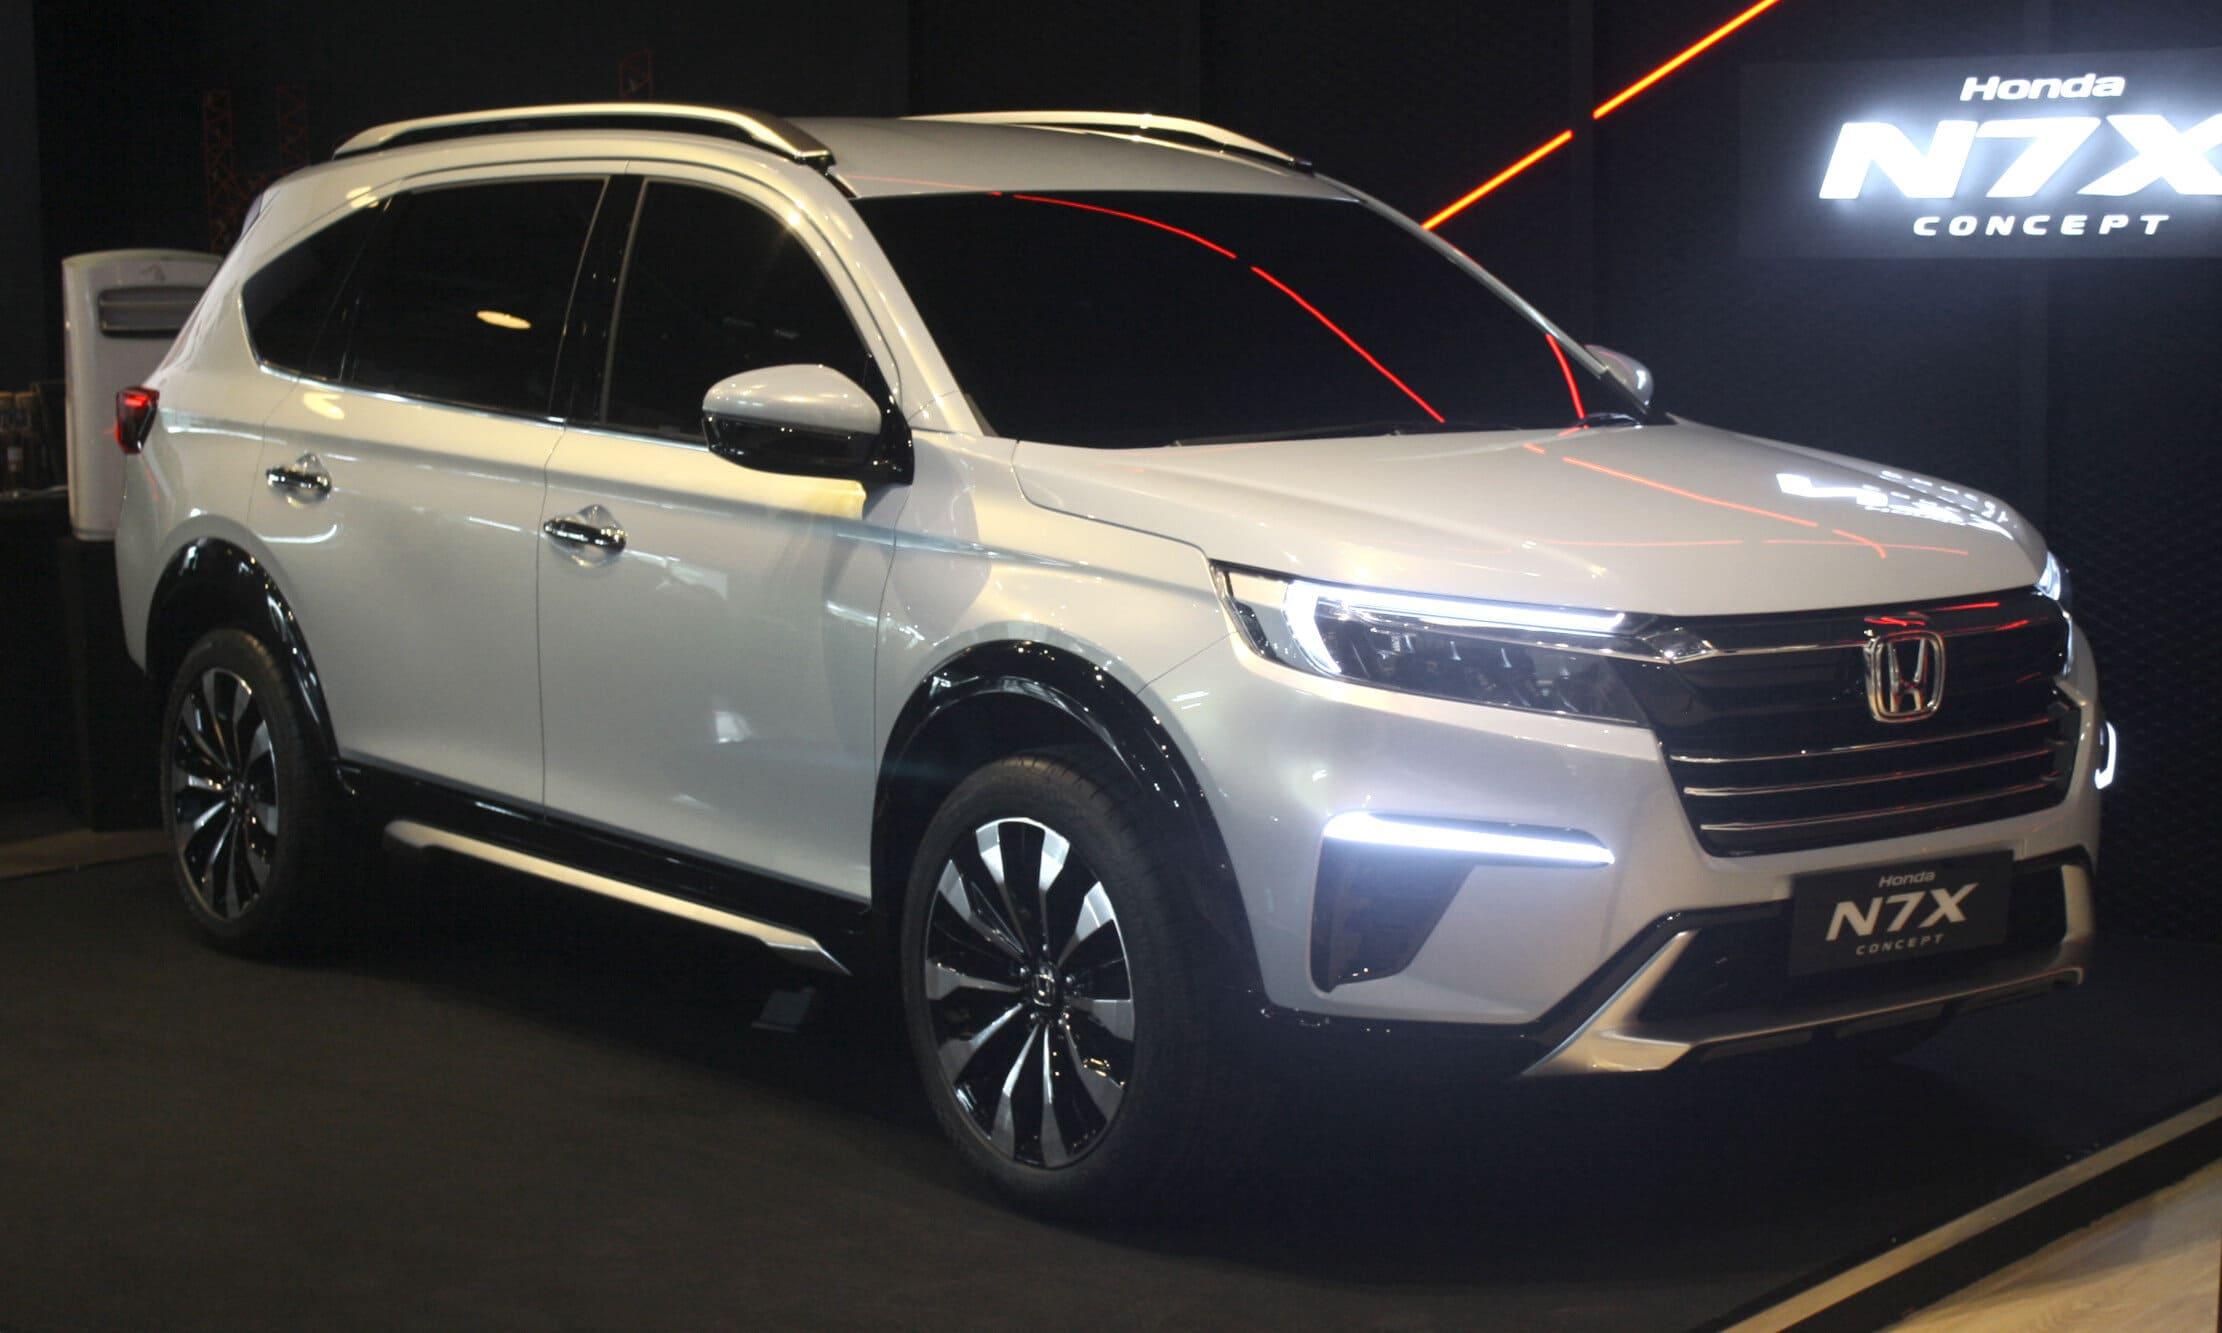 Honda N7X 2022 фото